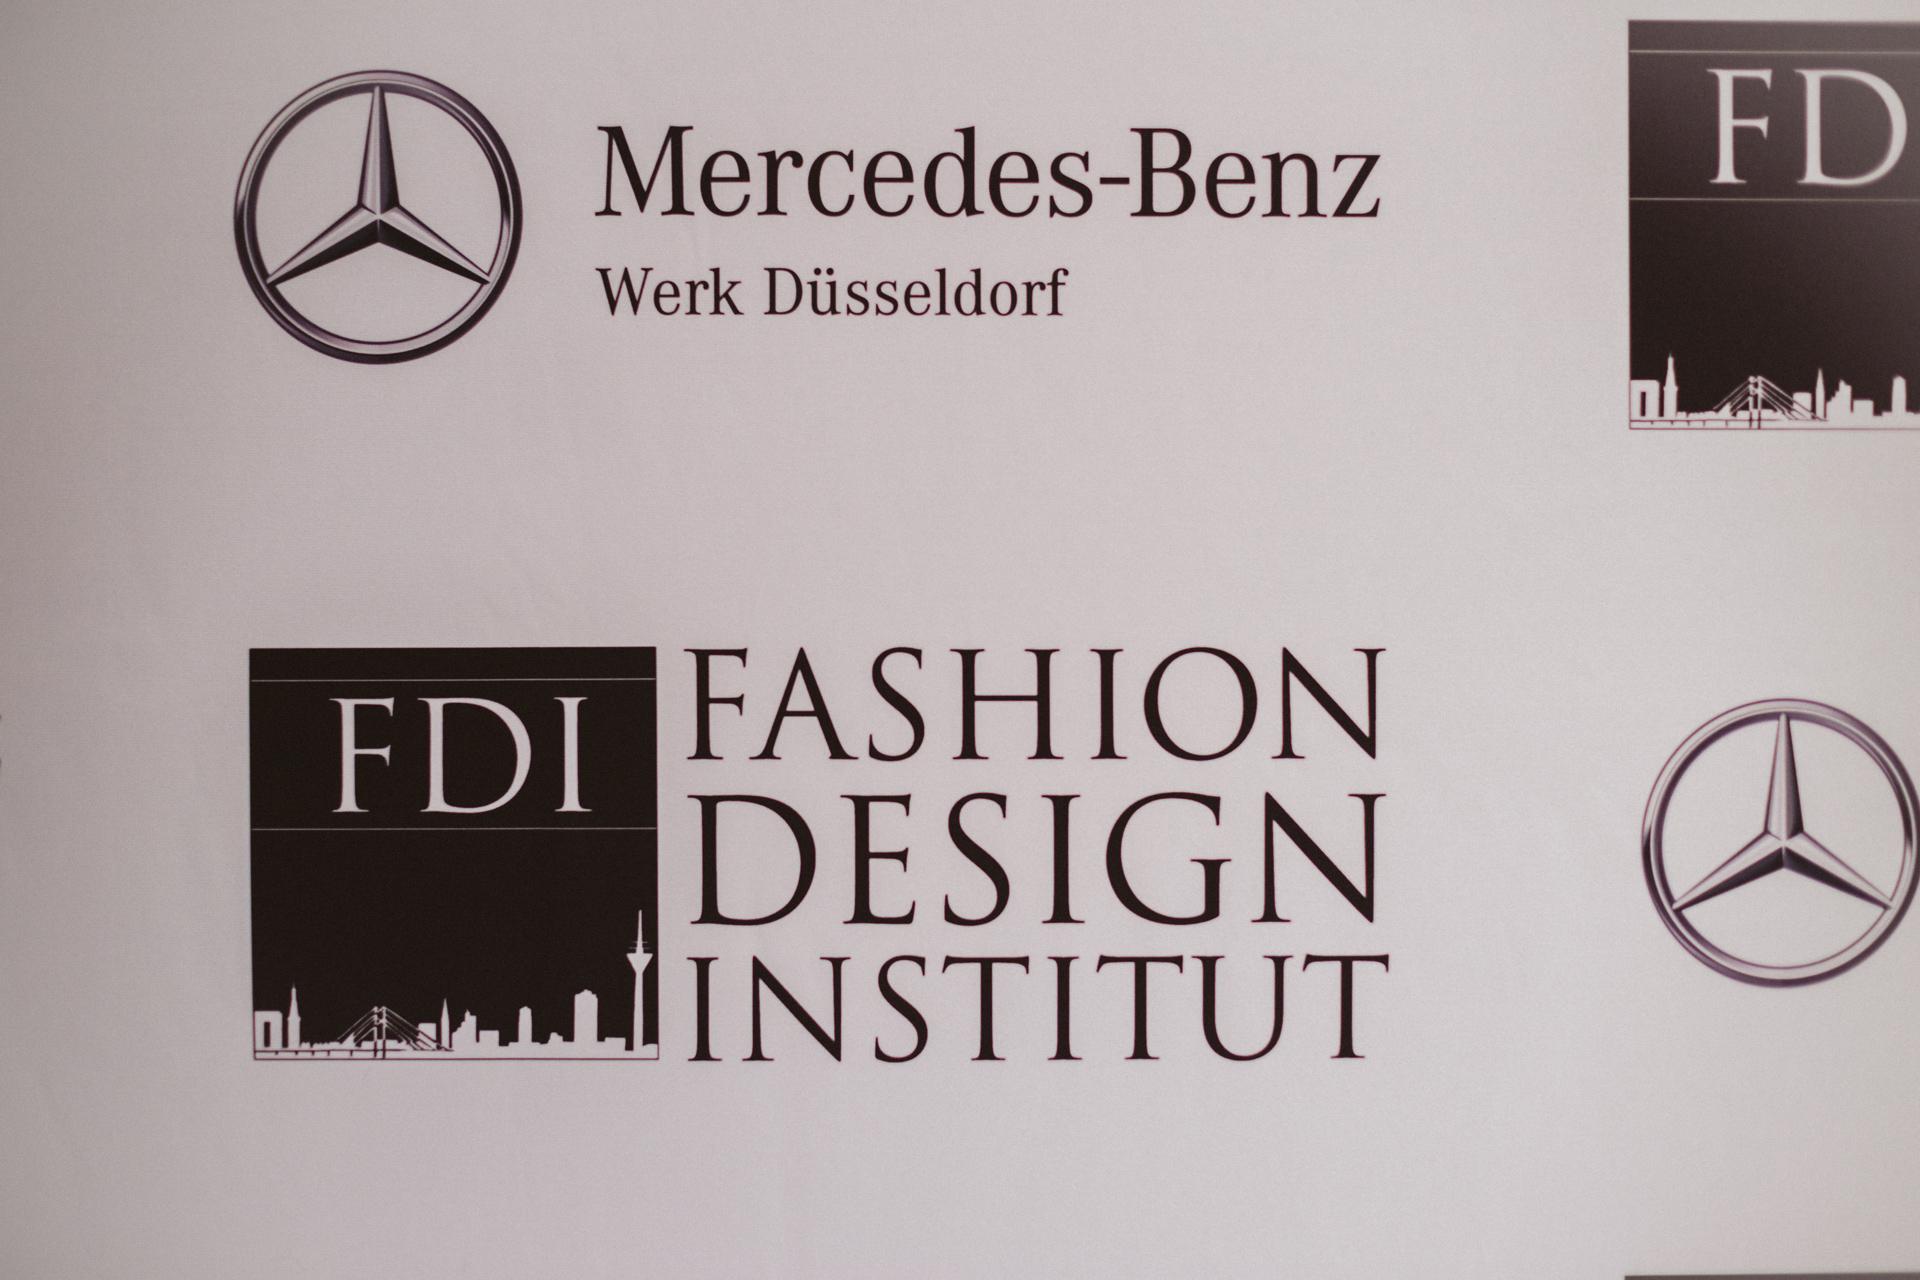 FDI Mercedes-Benz